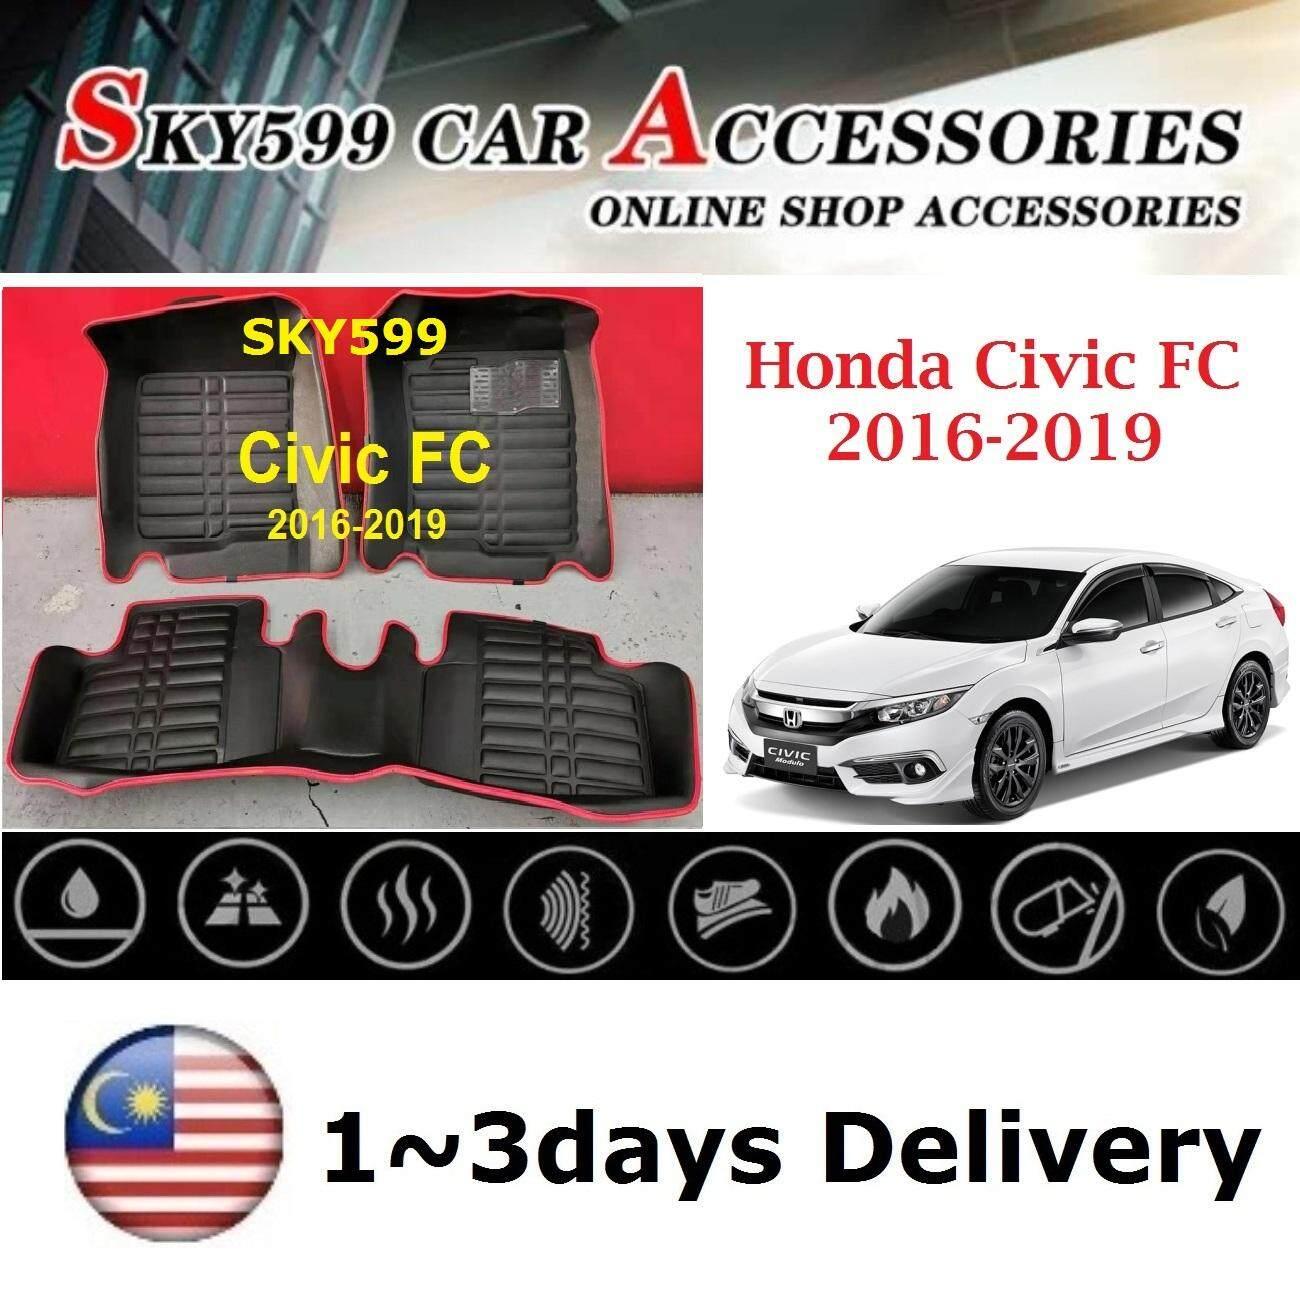 GGBAILEY D60238-F1A-GY Custom Fit Car Mats for 2016 2017 2018 2019 Honda Civic Hatchback Grey Driver /& Passenger Floor